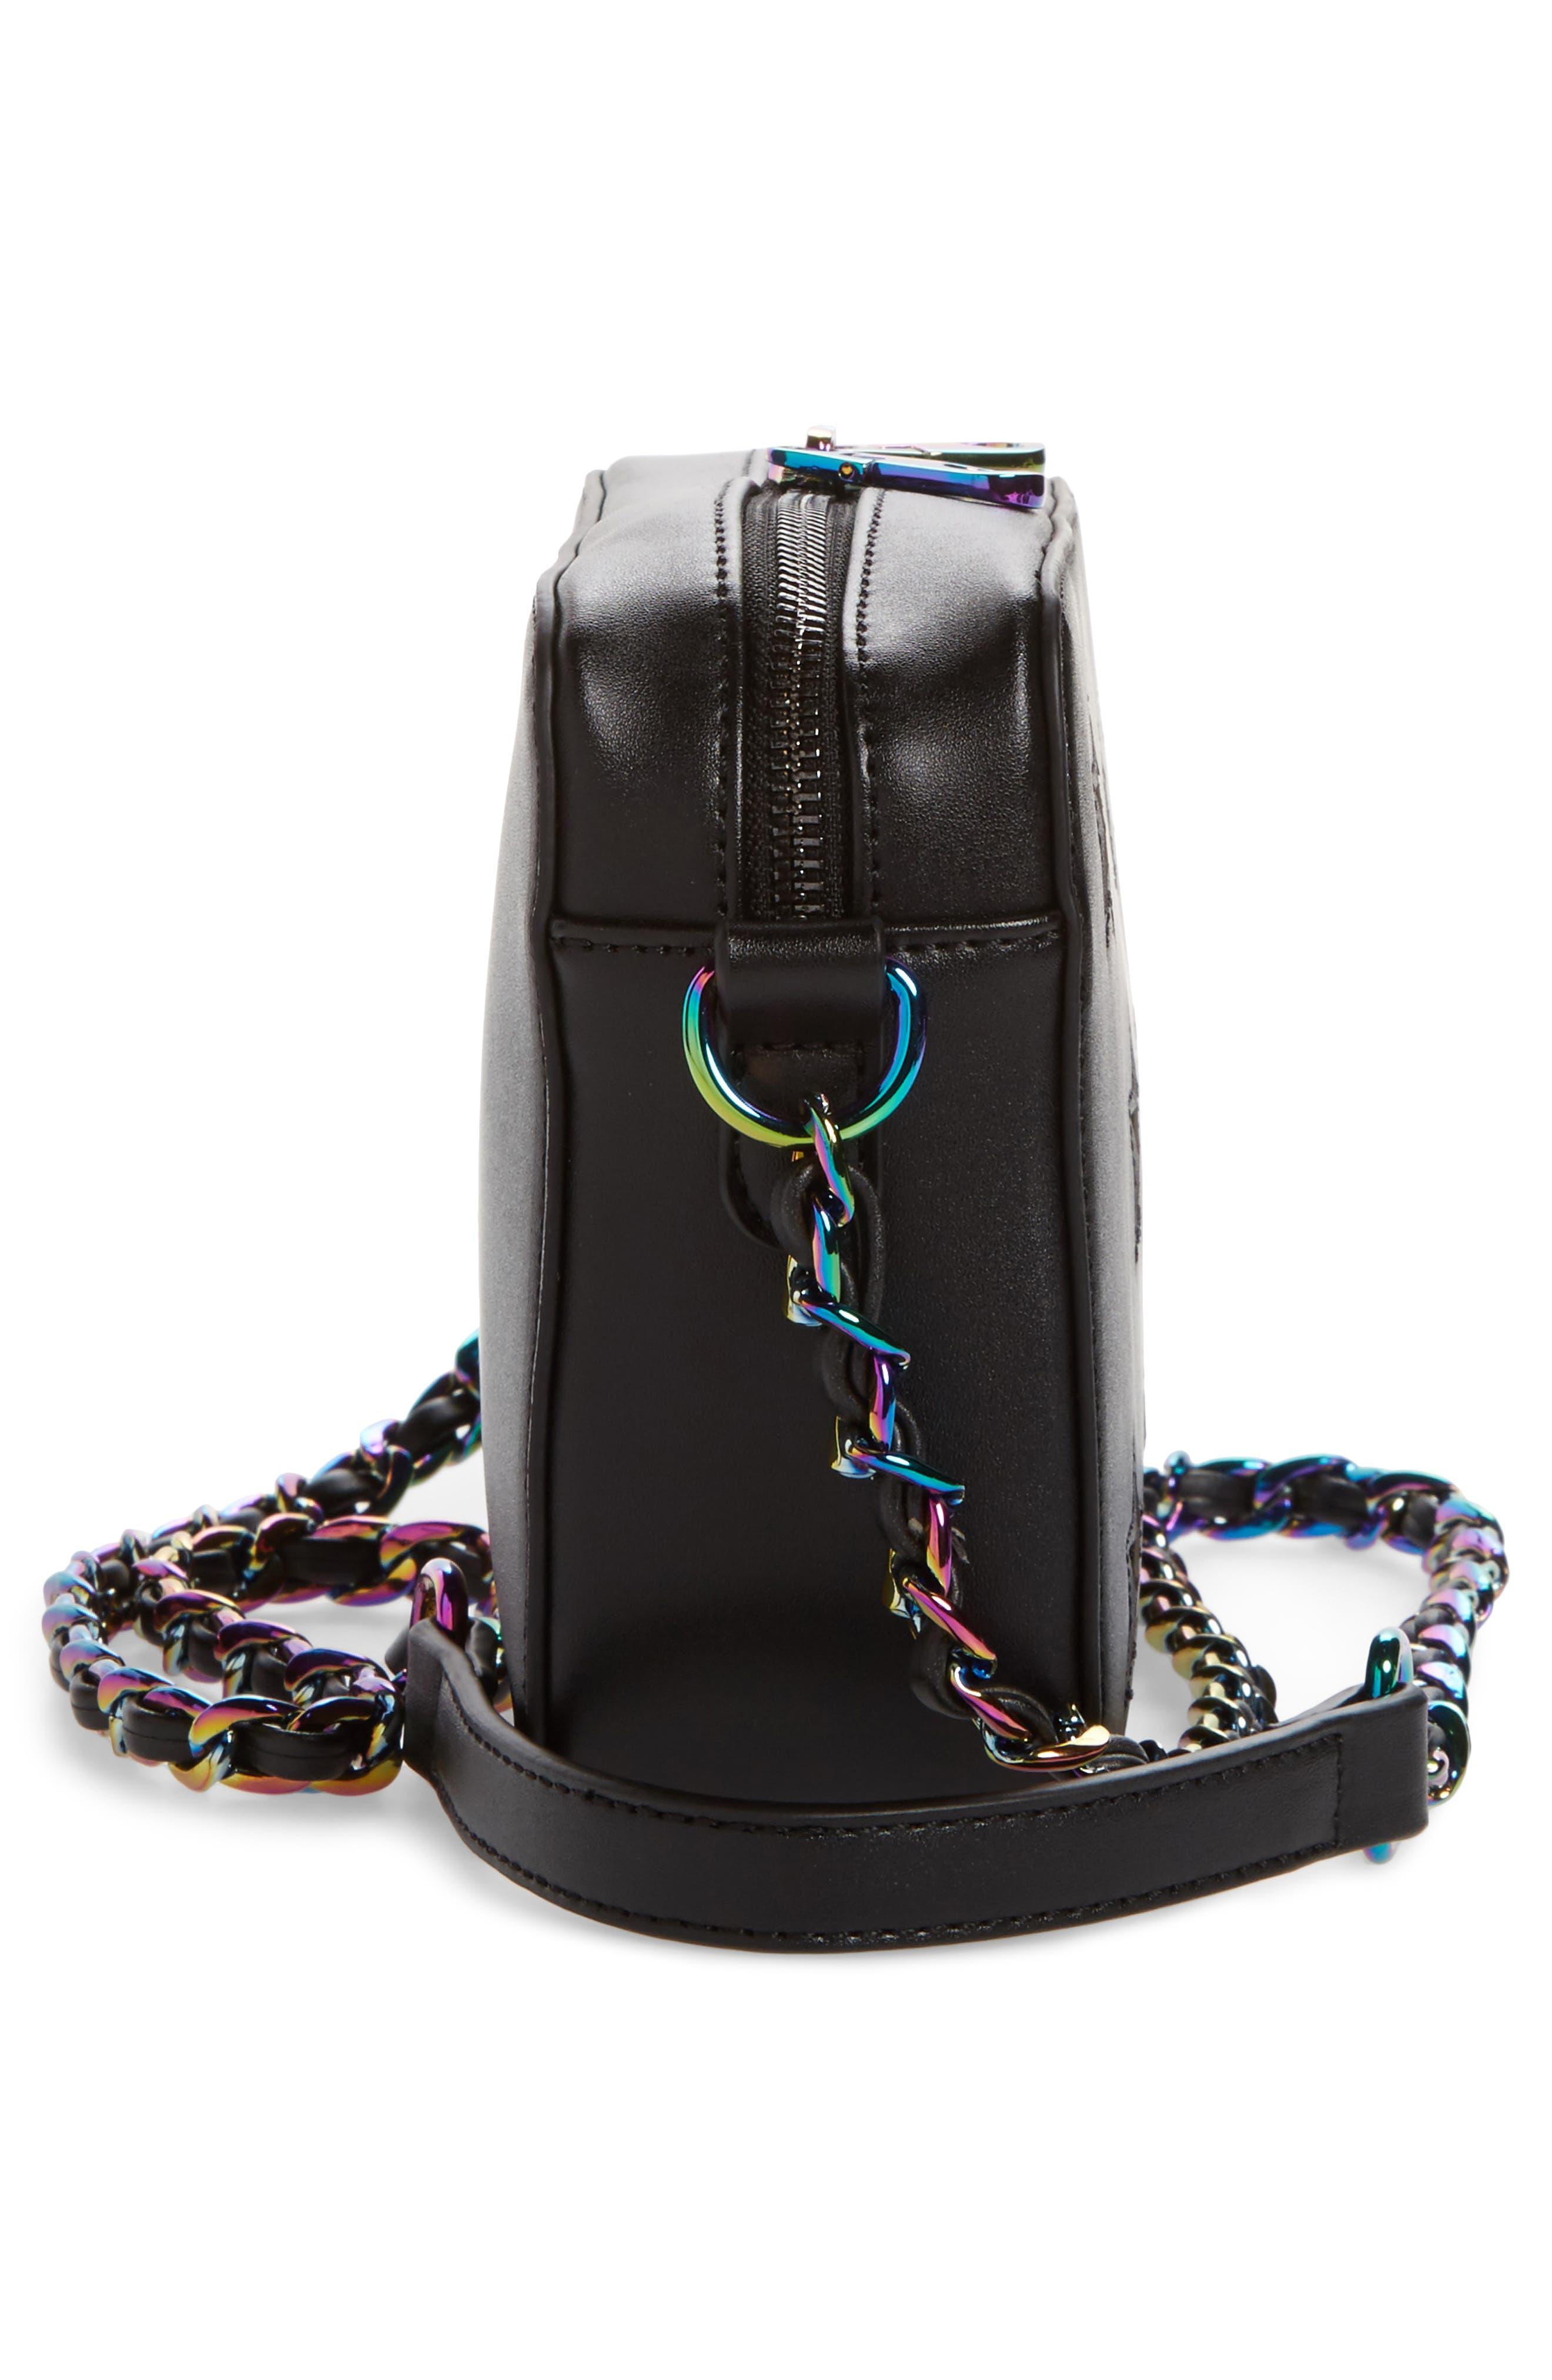 Bella Glitter Star Faux Leather Crossbody Bag,                             Alternate thumbnail 5, color,